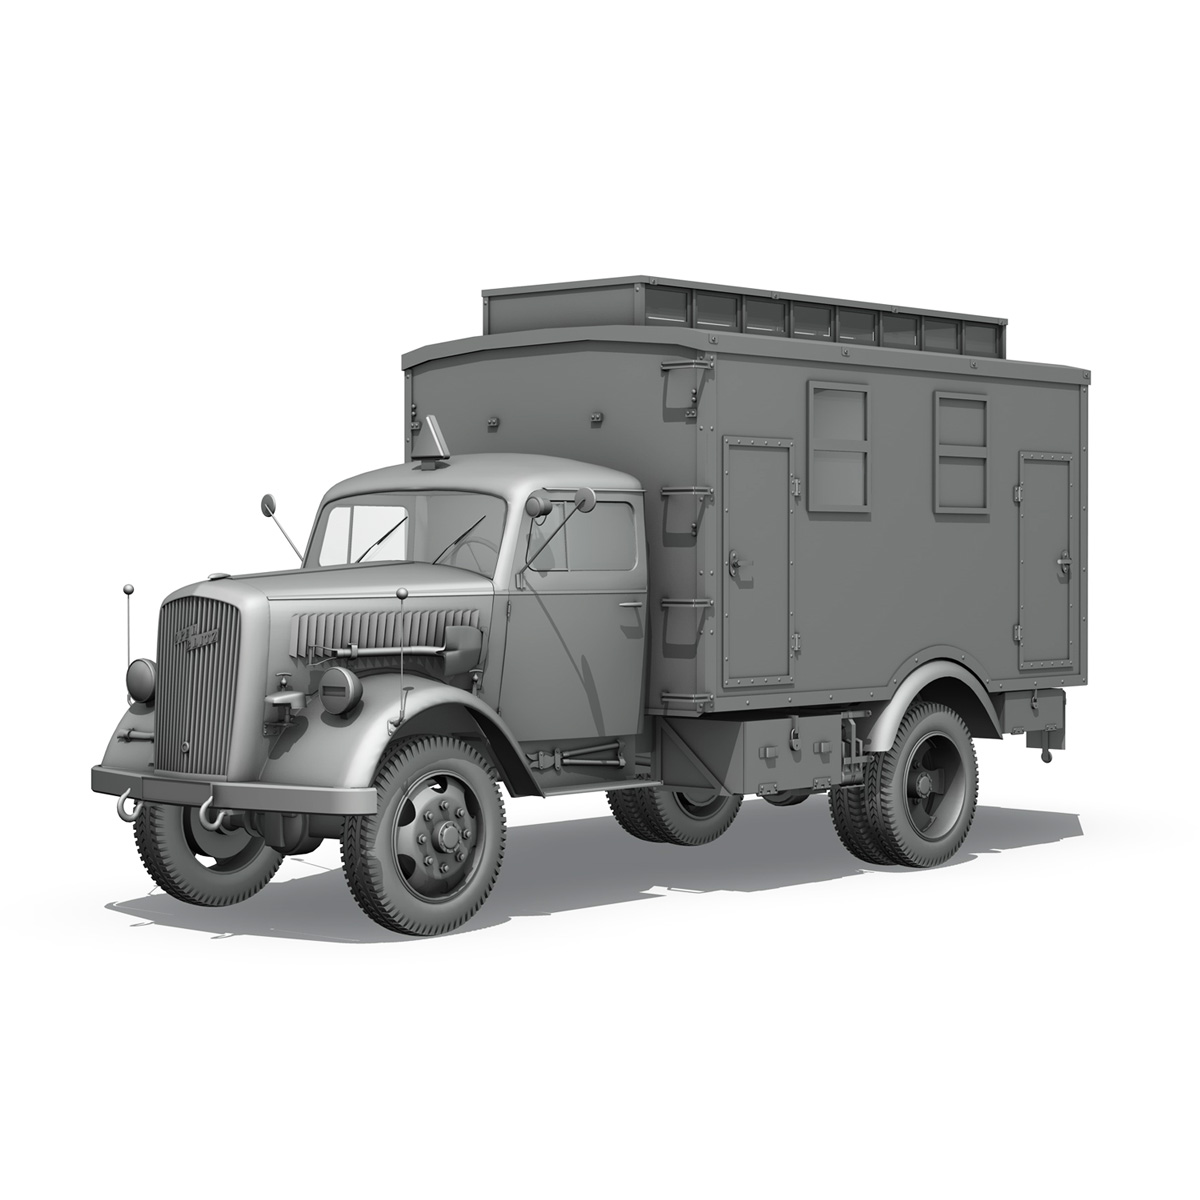 opel blitz – 3t ambulance truck – 2 pzdiv 3d model 3ds c4d fbx lwo lw lws obj 265763